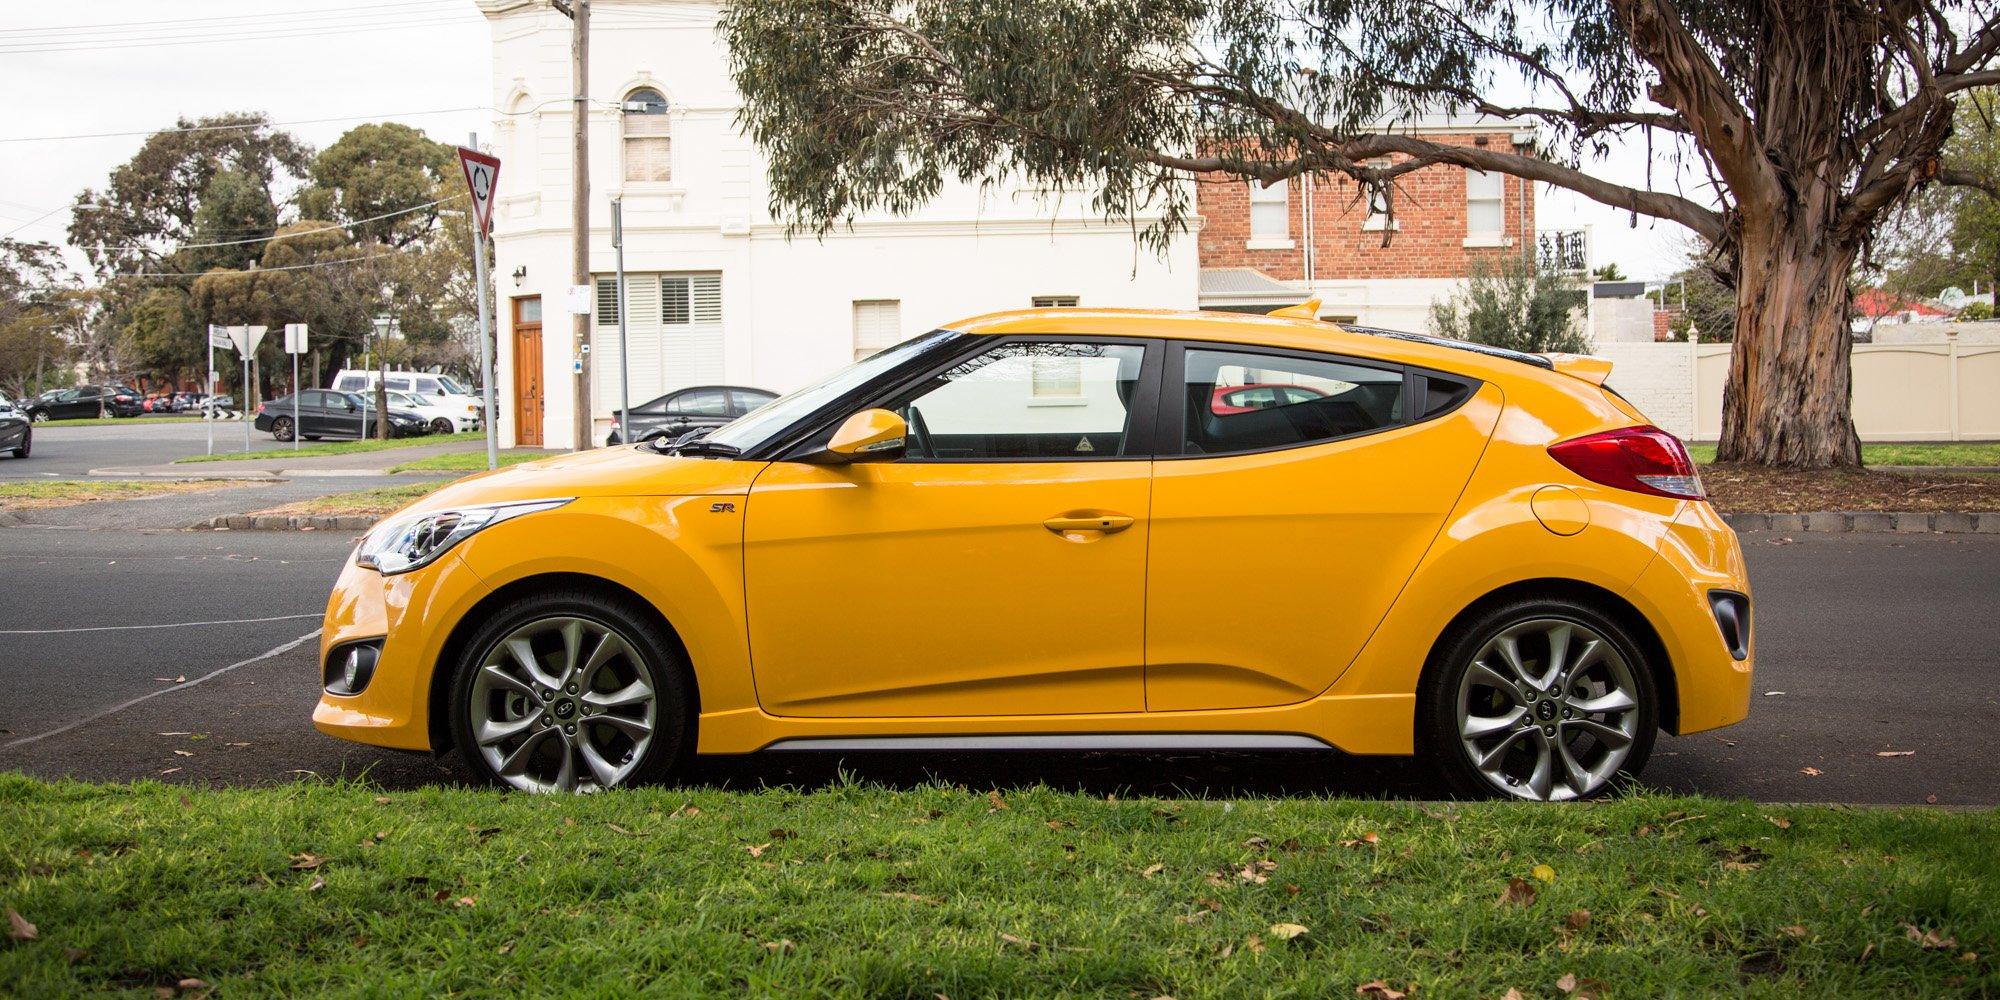 Toyota Rav4 2015 >> 2015 Hyundai Veloster SR Turbo Review - photos | CarAdvice